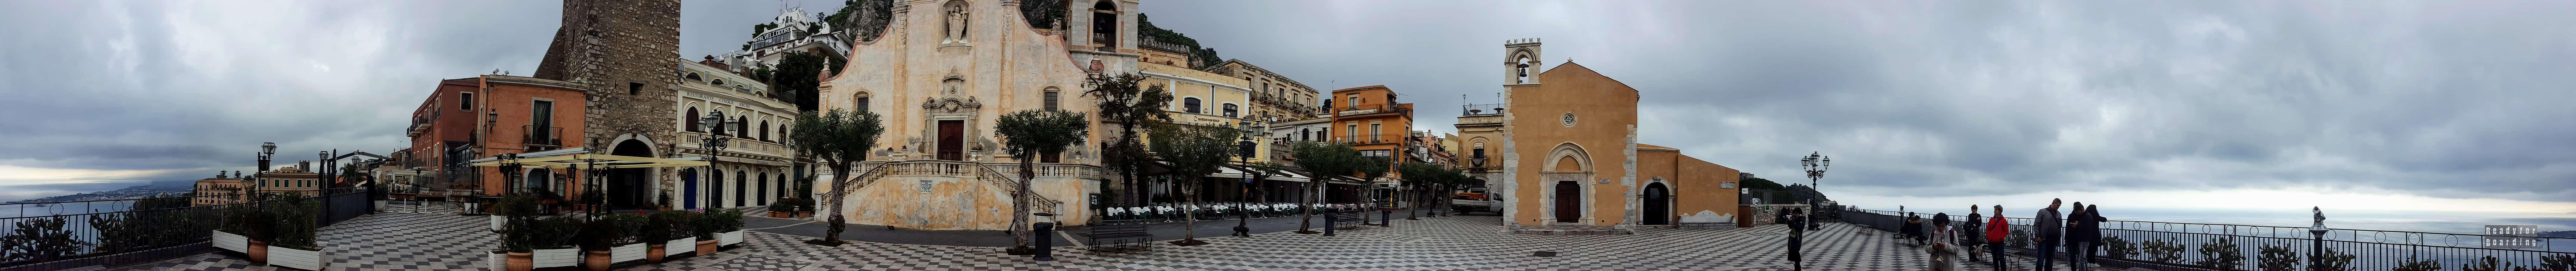 Panorama: Terrazza Sul Mare, Taormina - Sycylia